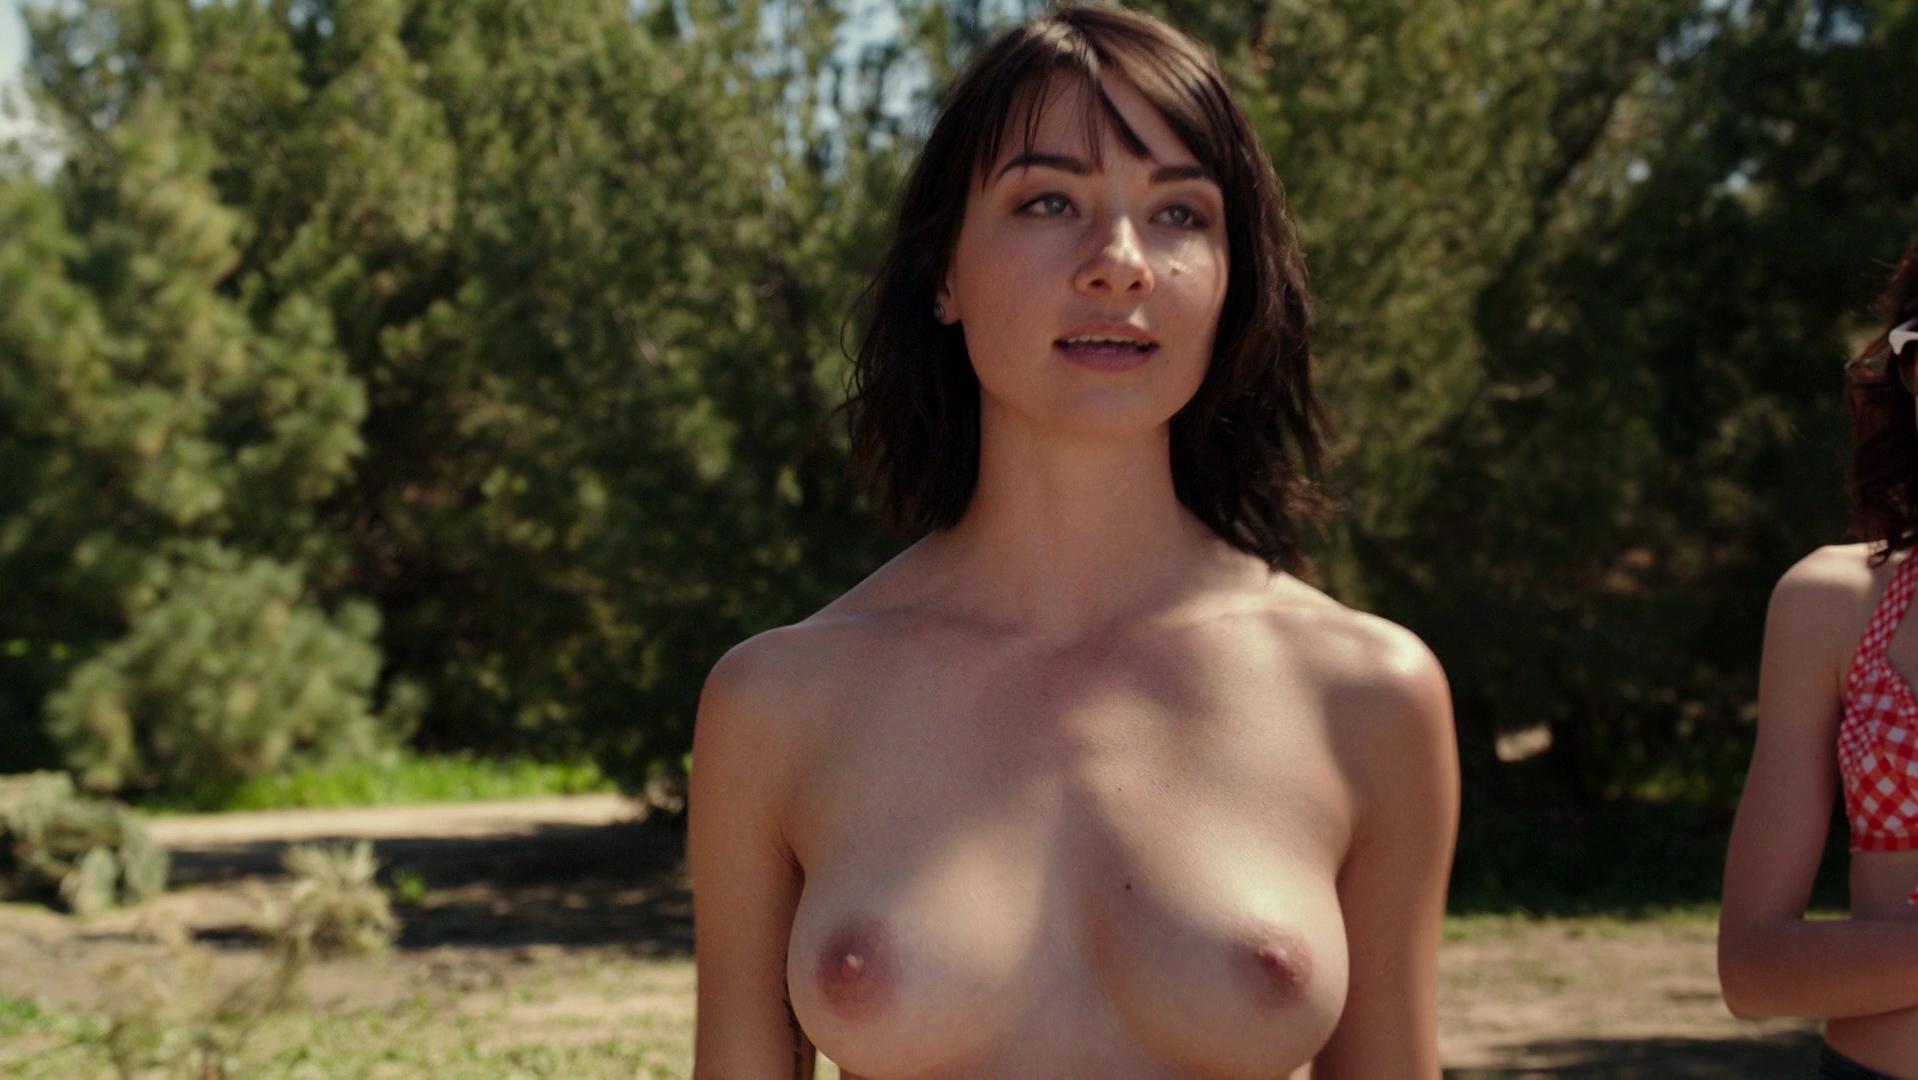 Cortney Palm nude, Lexi Atkins sexy, Rachel Melvin sexy - Zombeavers (2014)